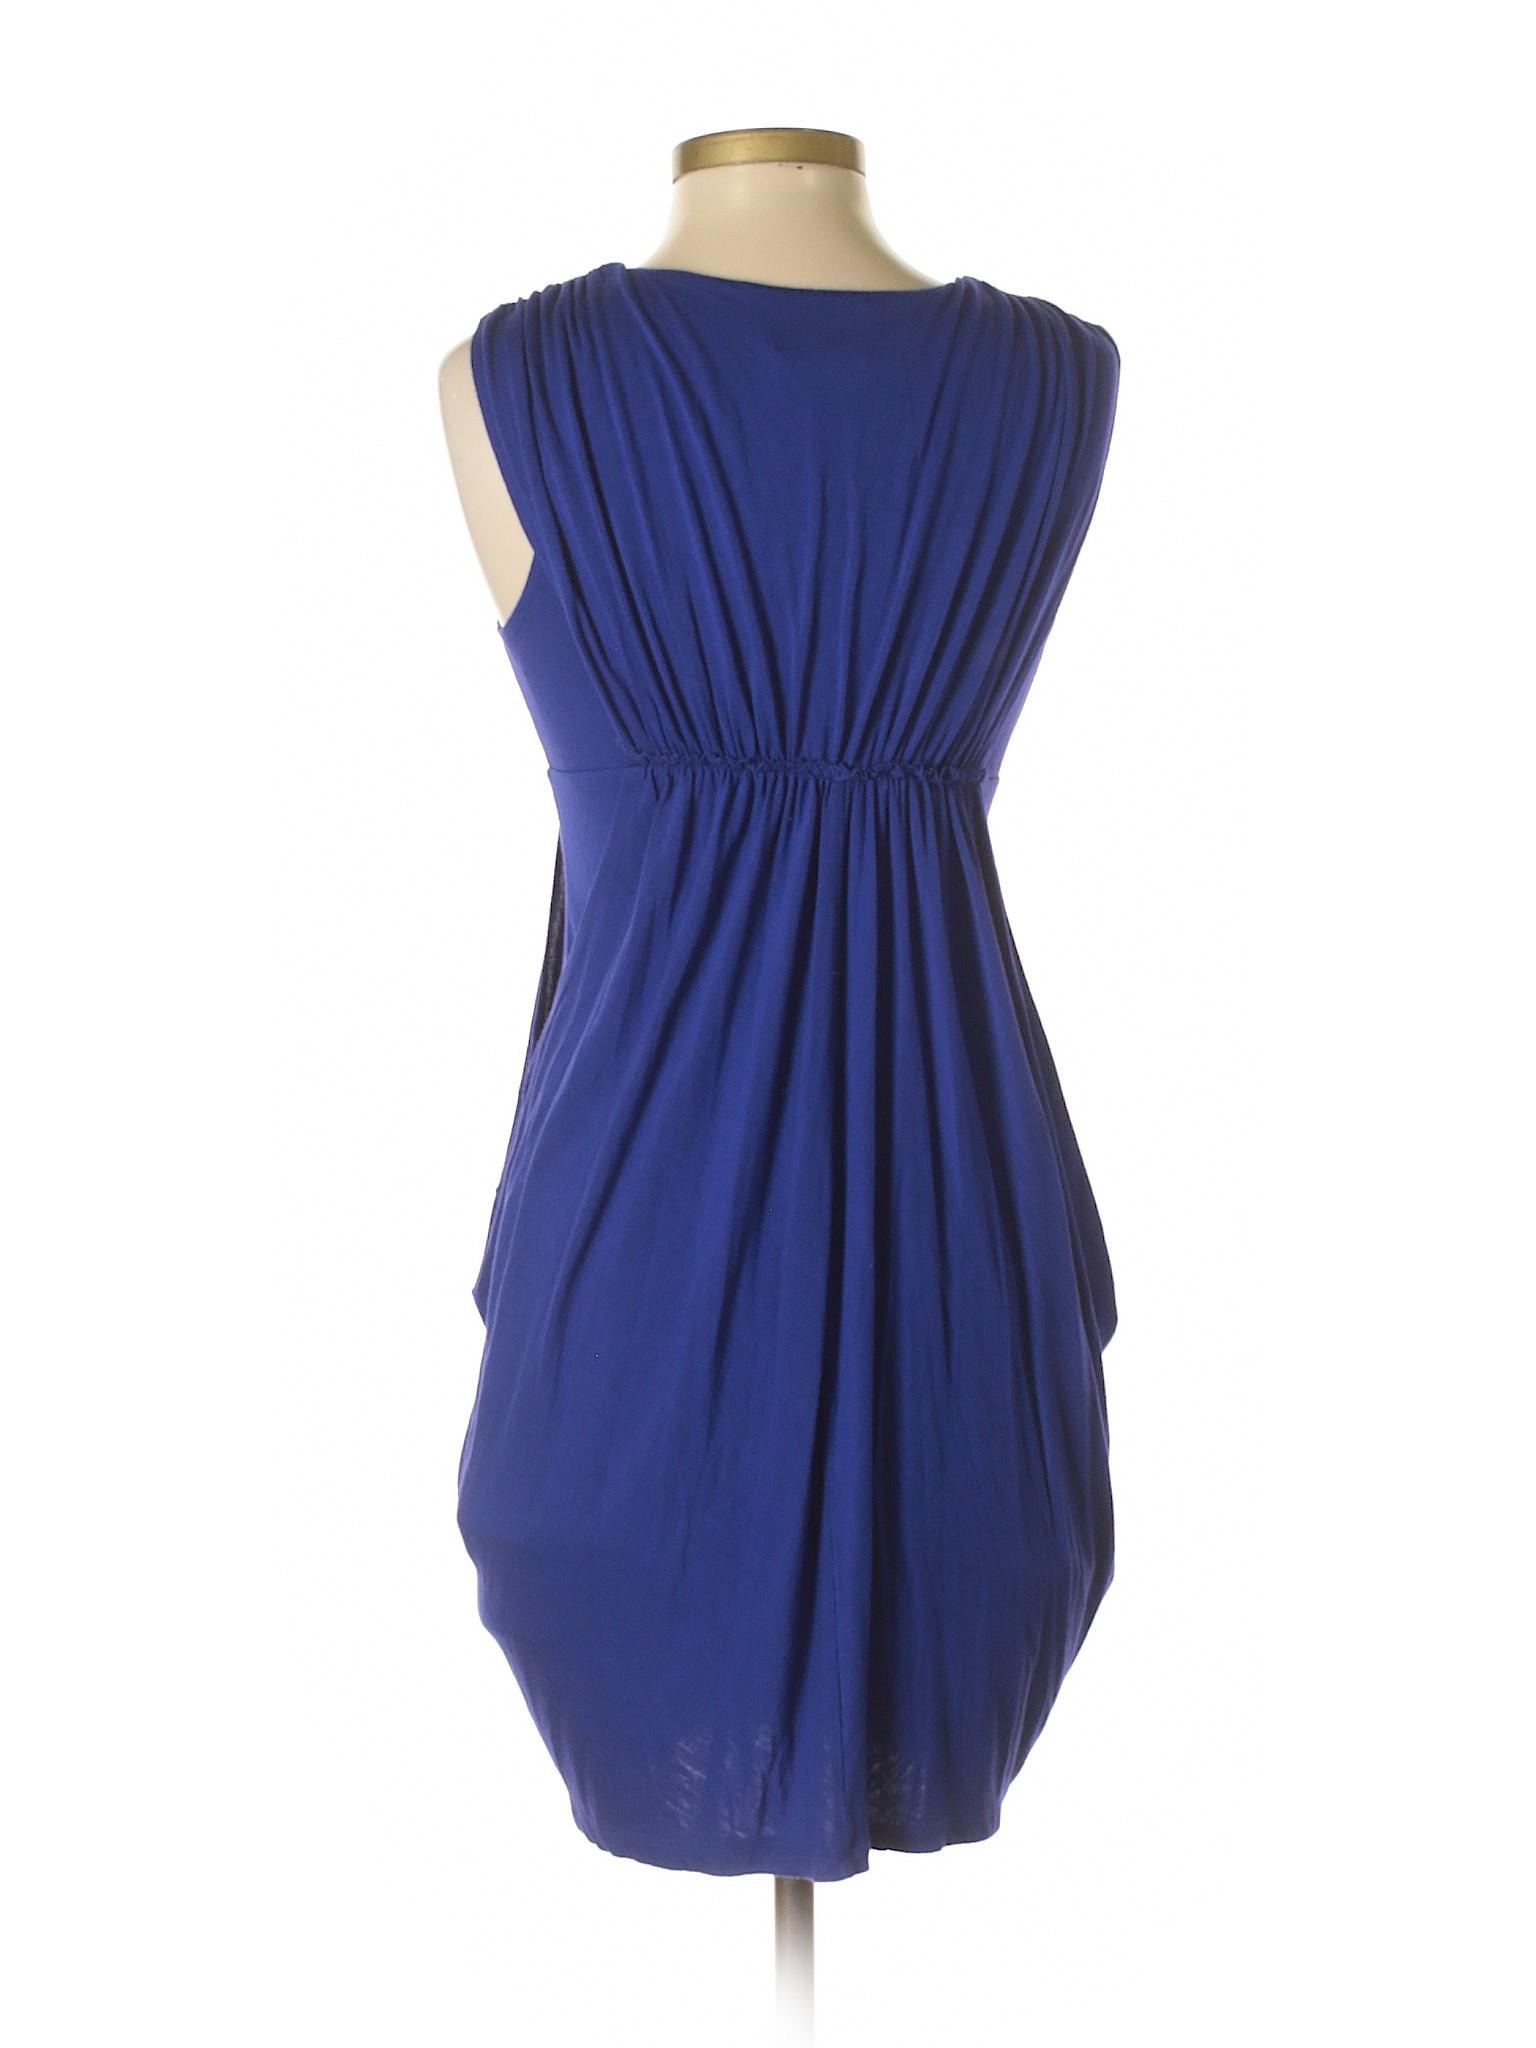 Casual Forever Dress winter 21 Boutique 1wZtxK